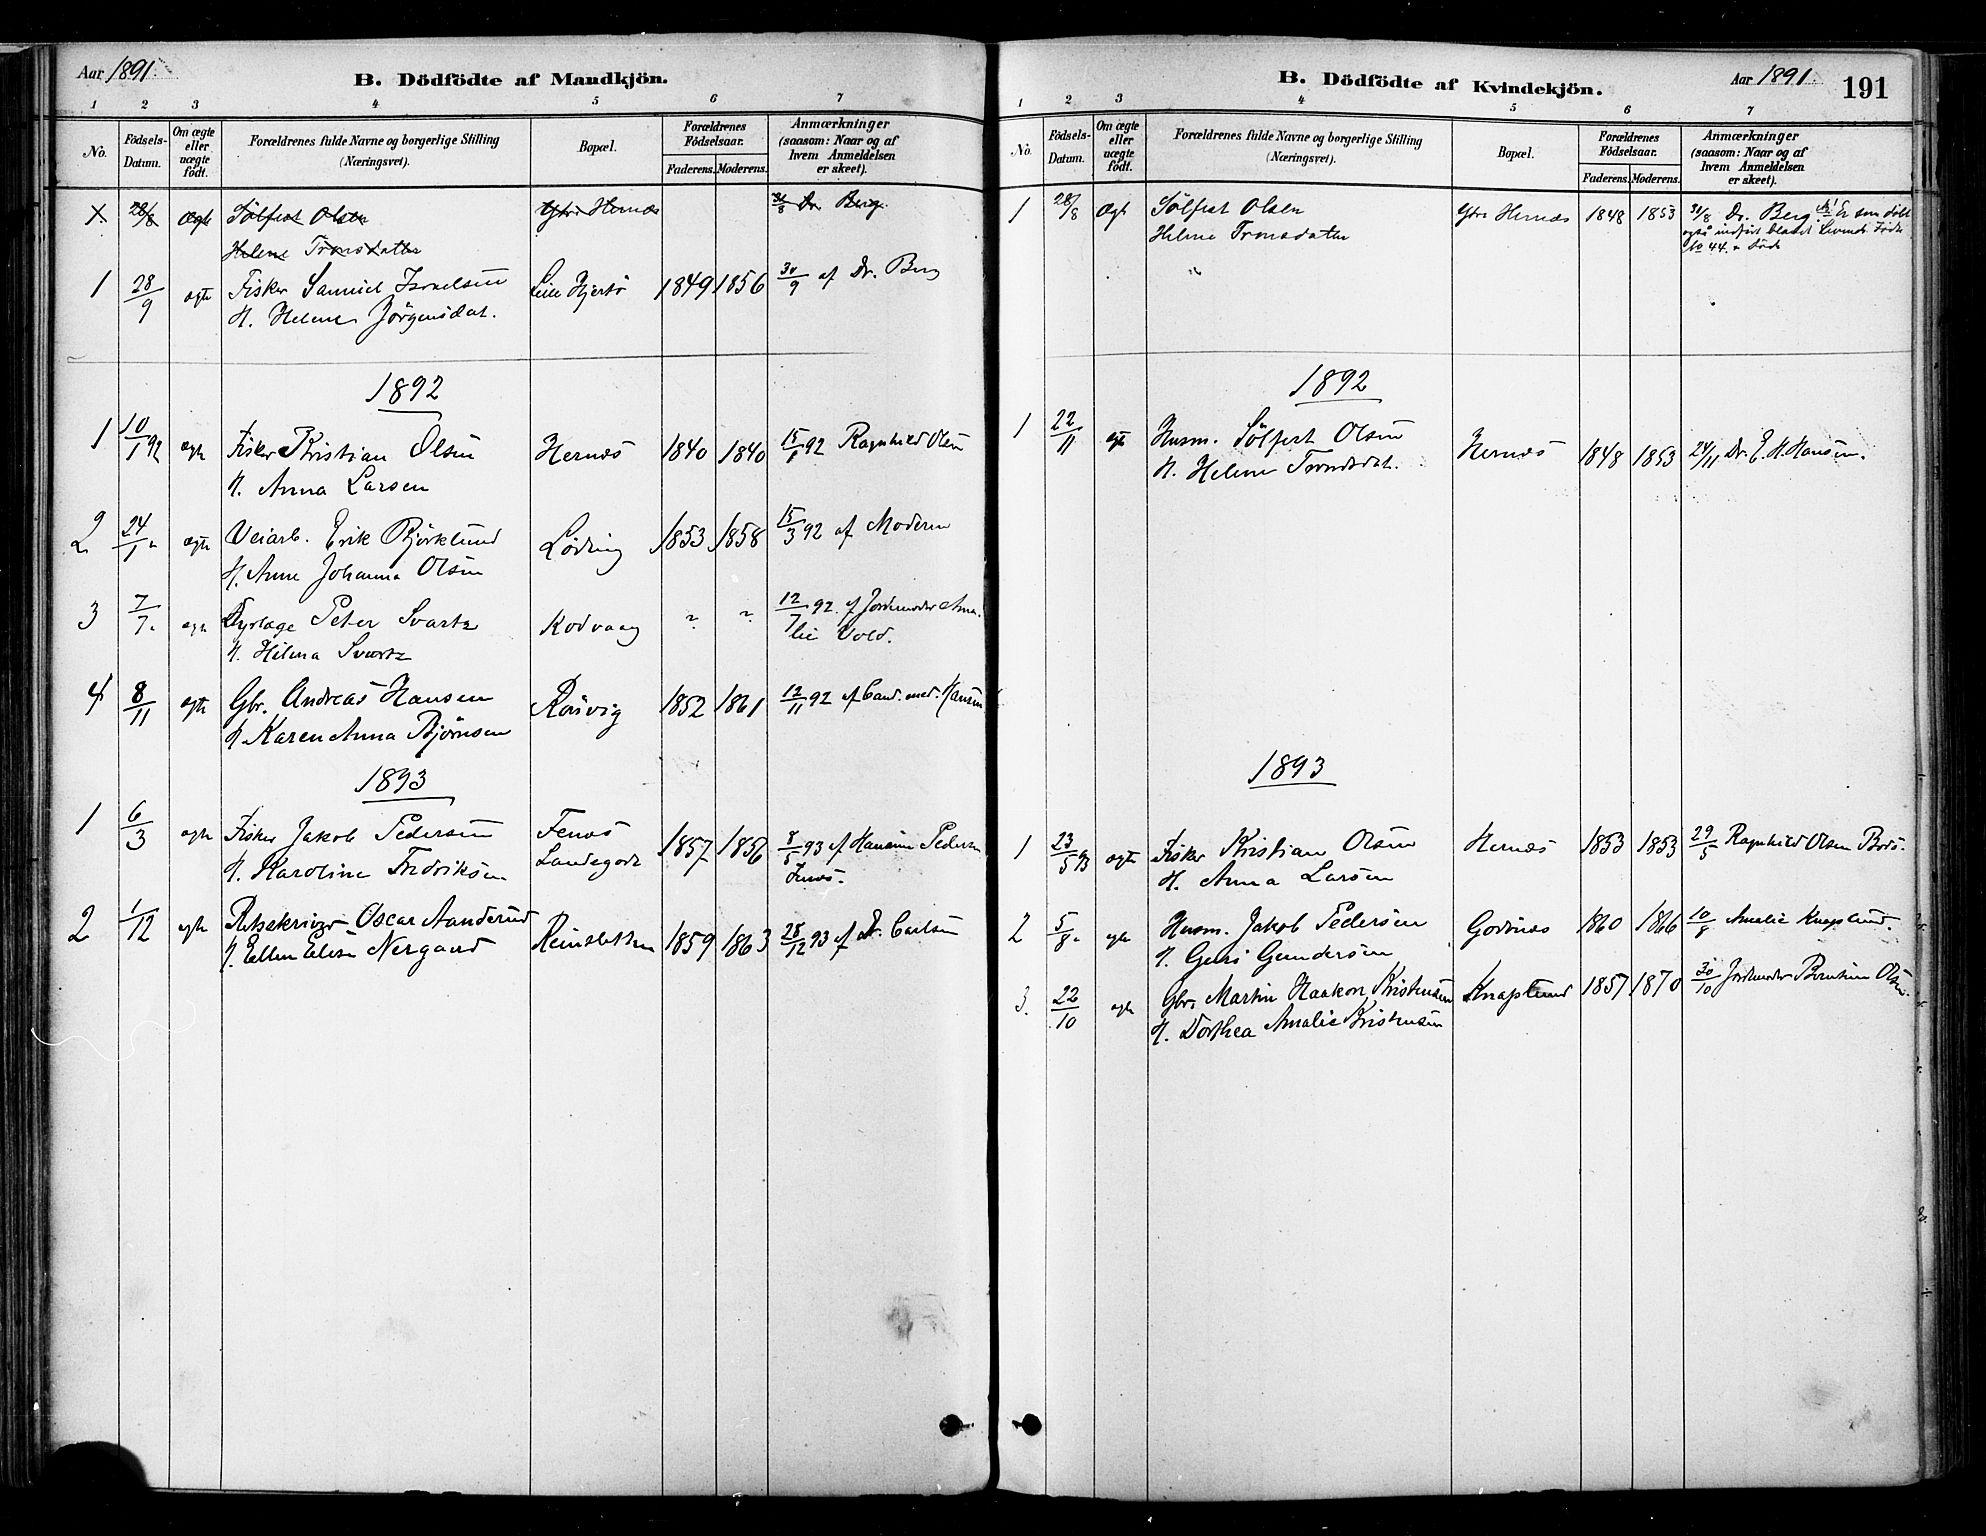 SAT, Ministerialprotokoller, klokkerbøker og fødselsregistre - Nordland, 802/L0054: Ministerialbok nr. 802A01, 1879-1893, s. 191